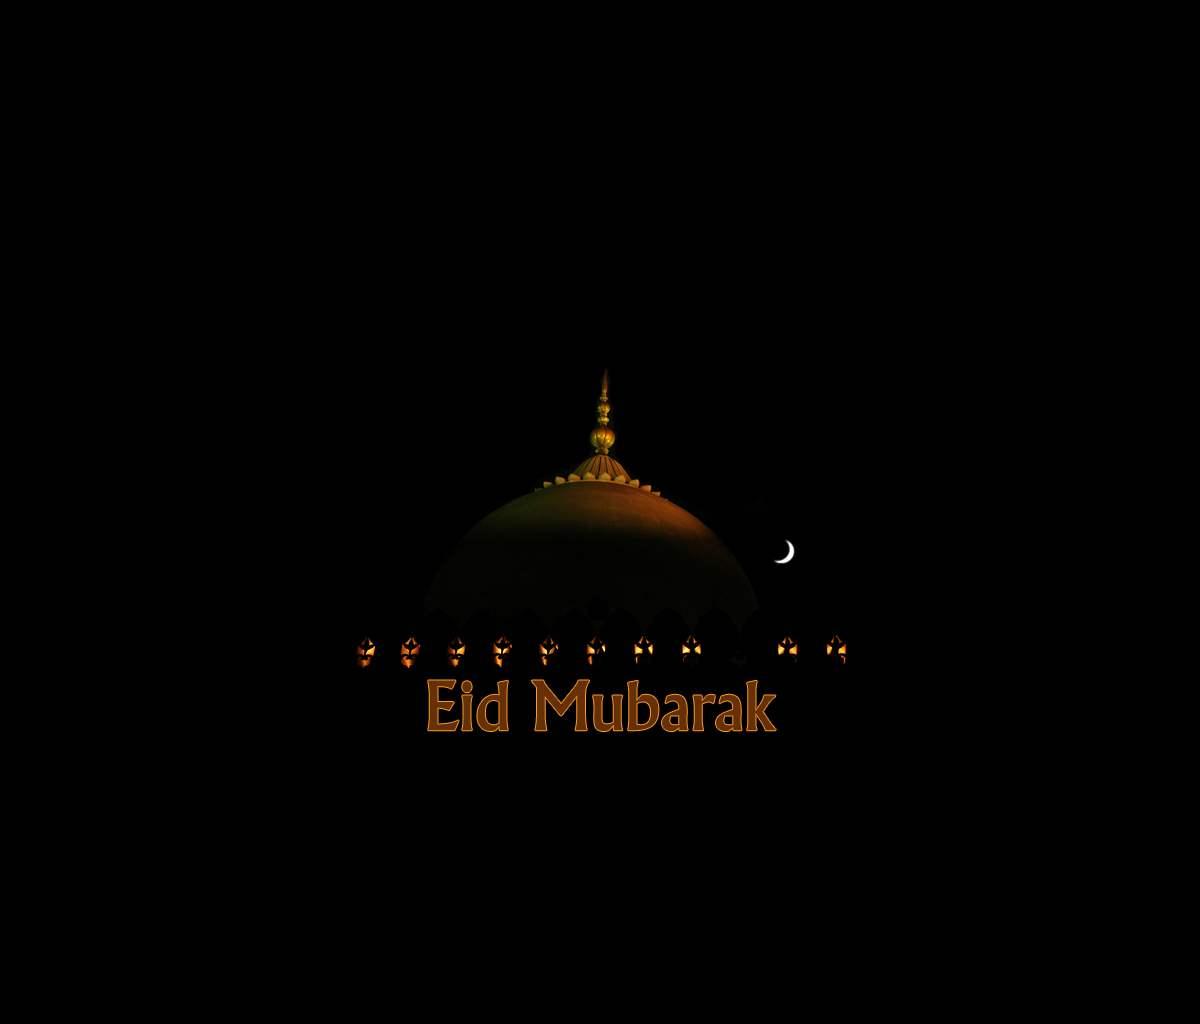 eid mubarak wallpaper 2015